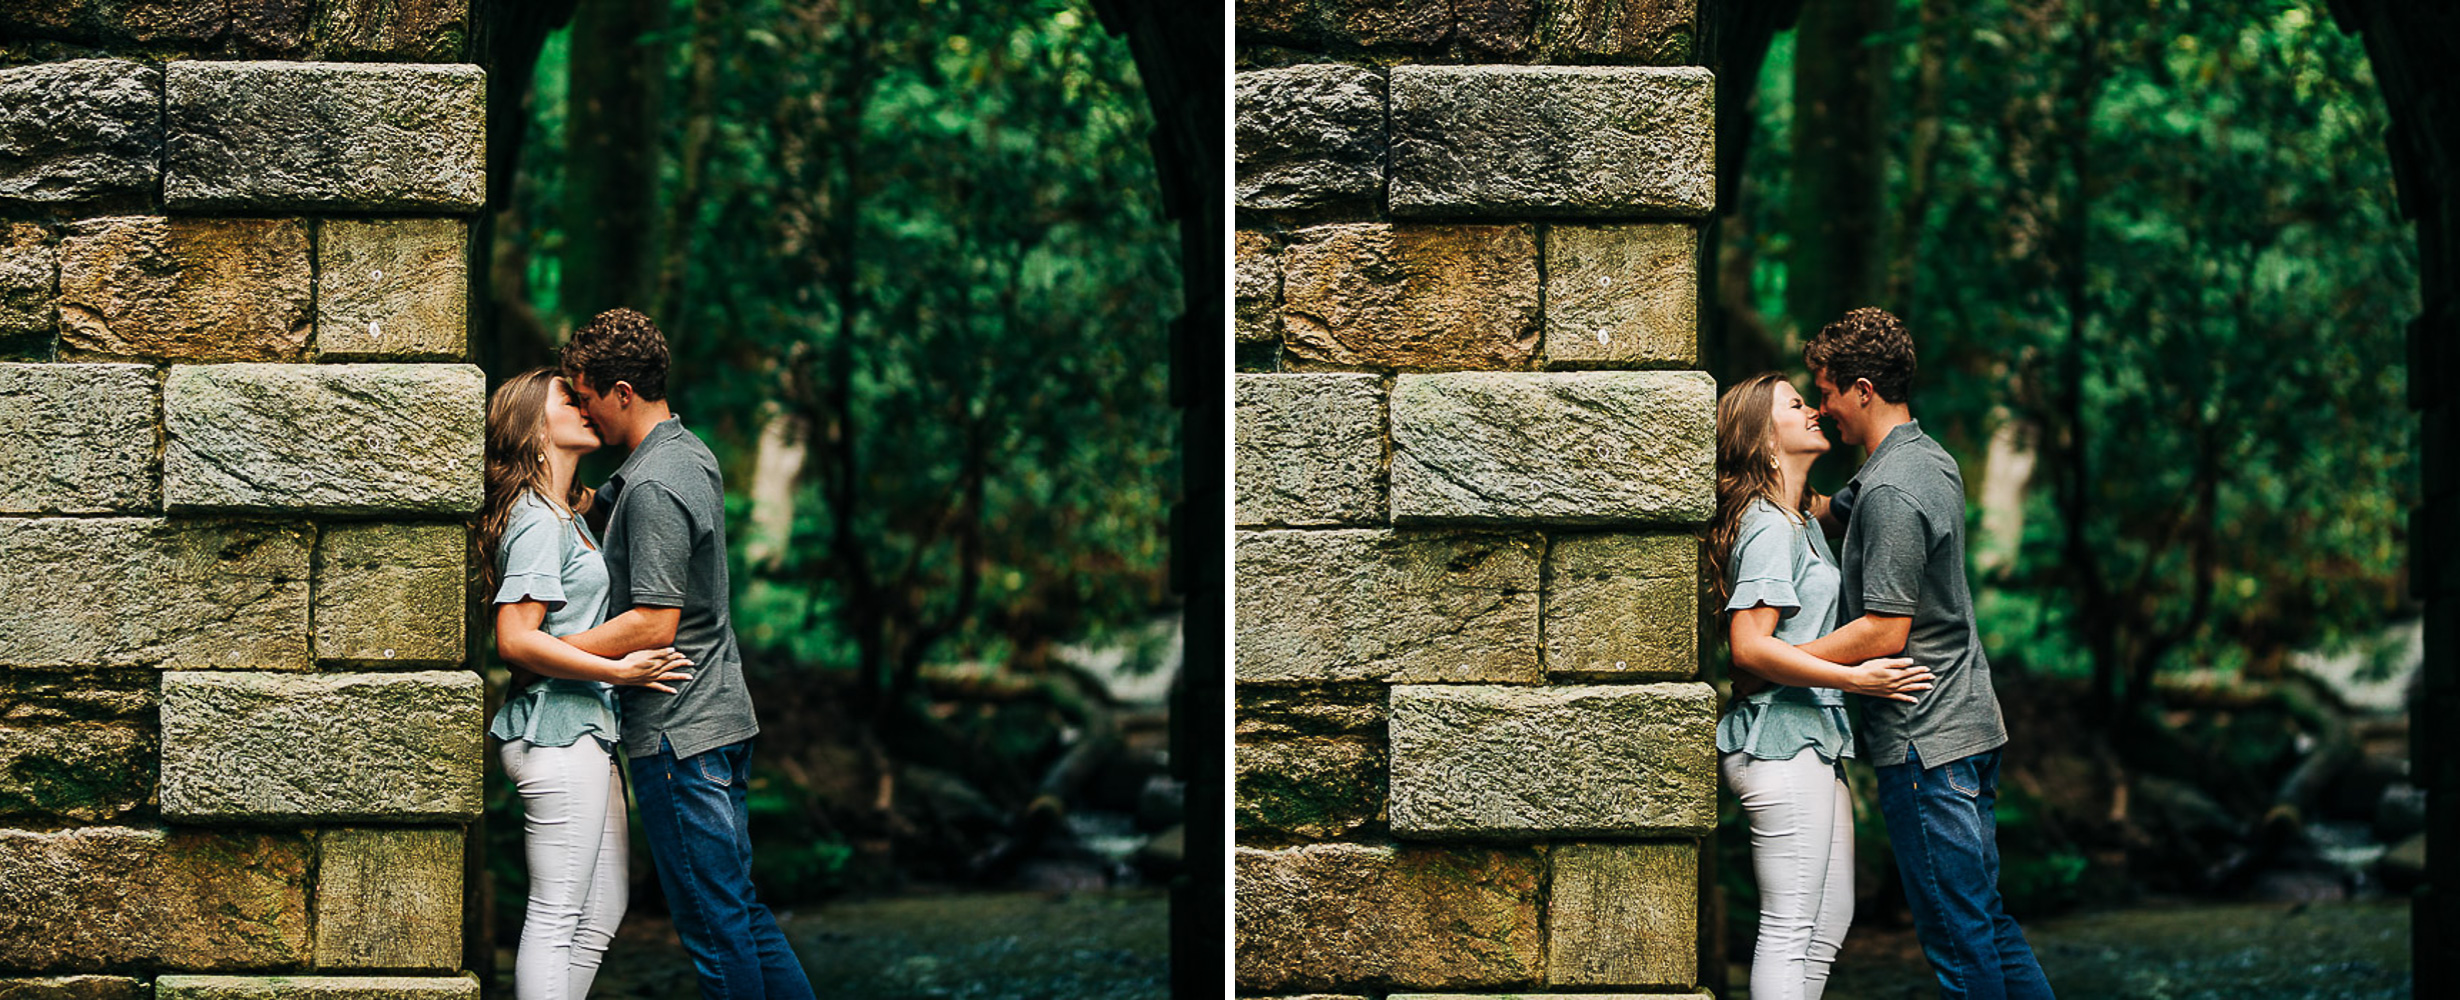 Engagement Portraits, Summer Engagement, Summer Mast Photography, 15.jpg